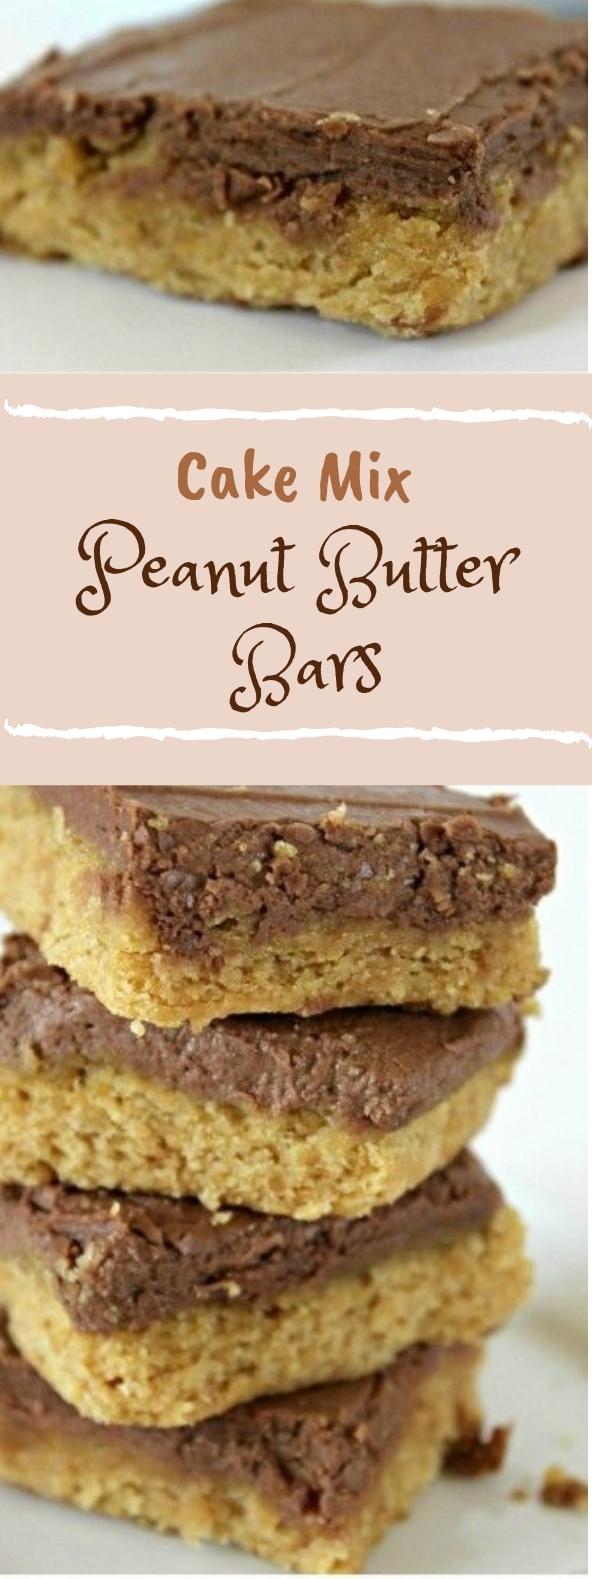 CAKE MIX PEANUT BUTTER BARS #cake #peanutbutter